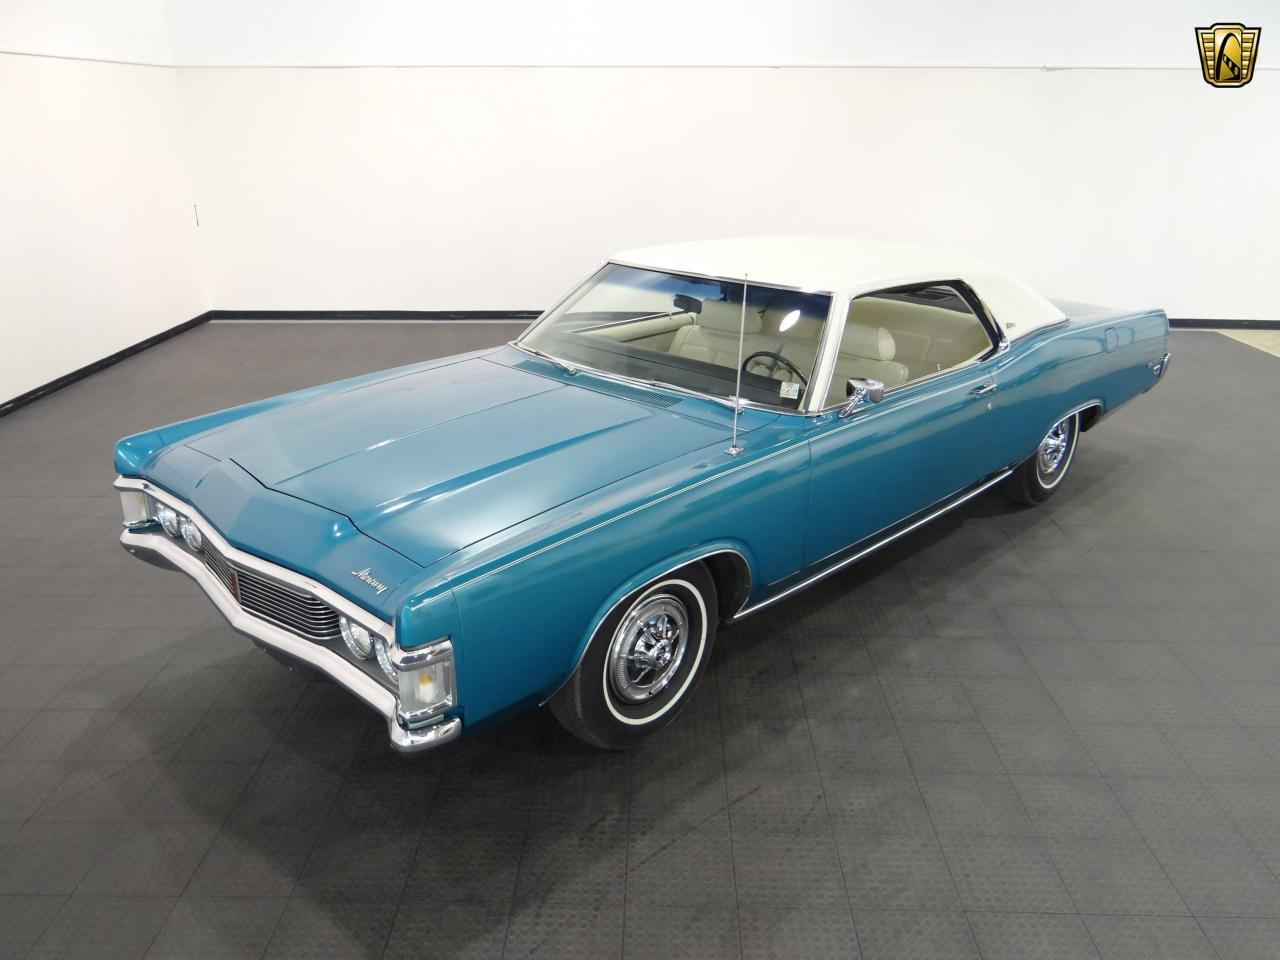 Large Picture of '69 Mercury Monterey - $17,995.00 - KECC